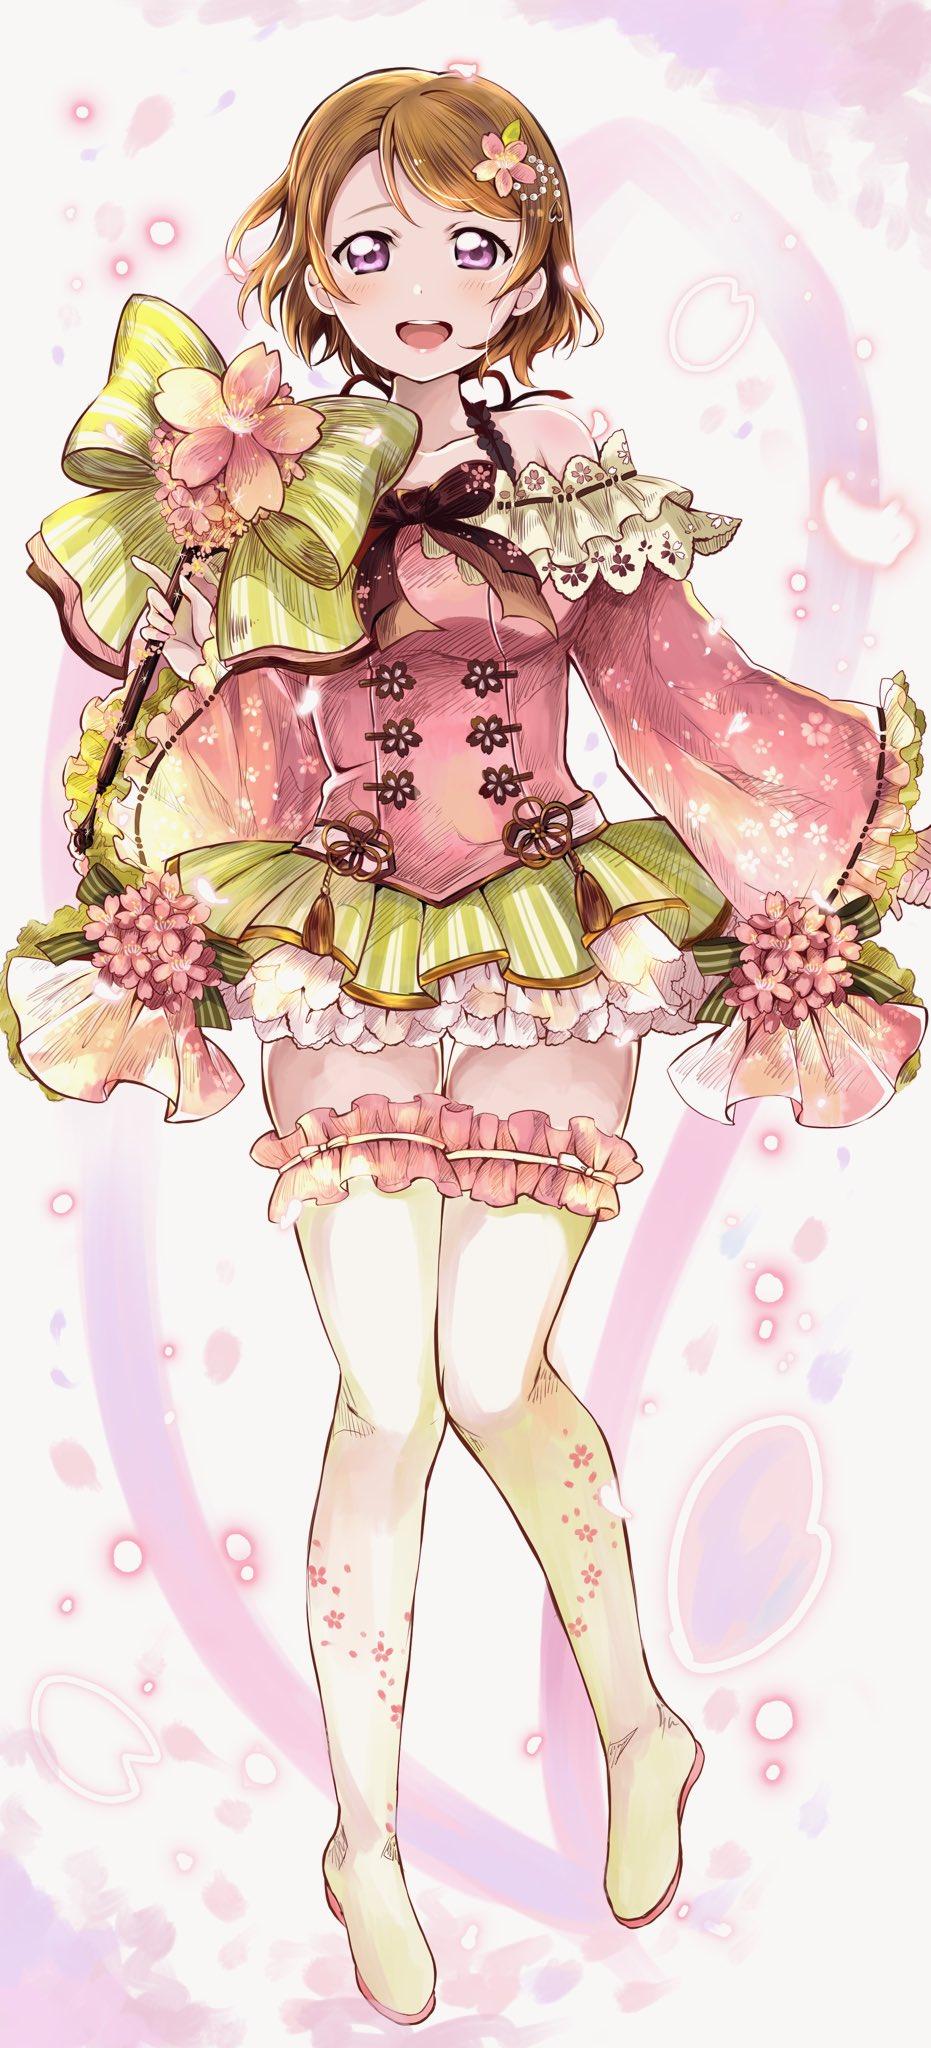 1girl boots flower_ornament green_hair happy_birthday highres koizumi_hanayo love_live! love_live!_school_idol_project shirokagi_tsukito short_hair thigh-highs thigh_boots violet_eyes